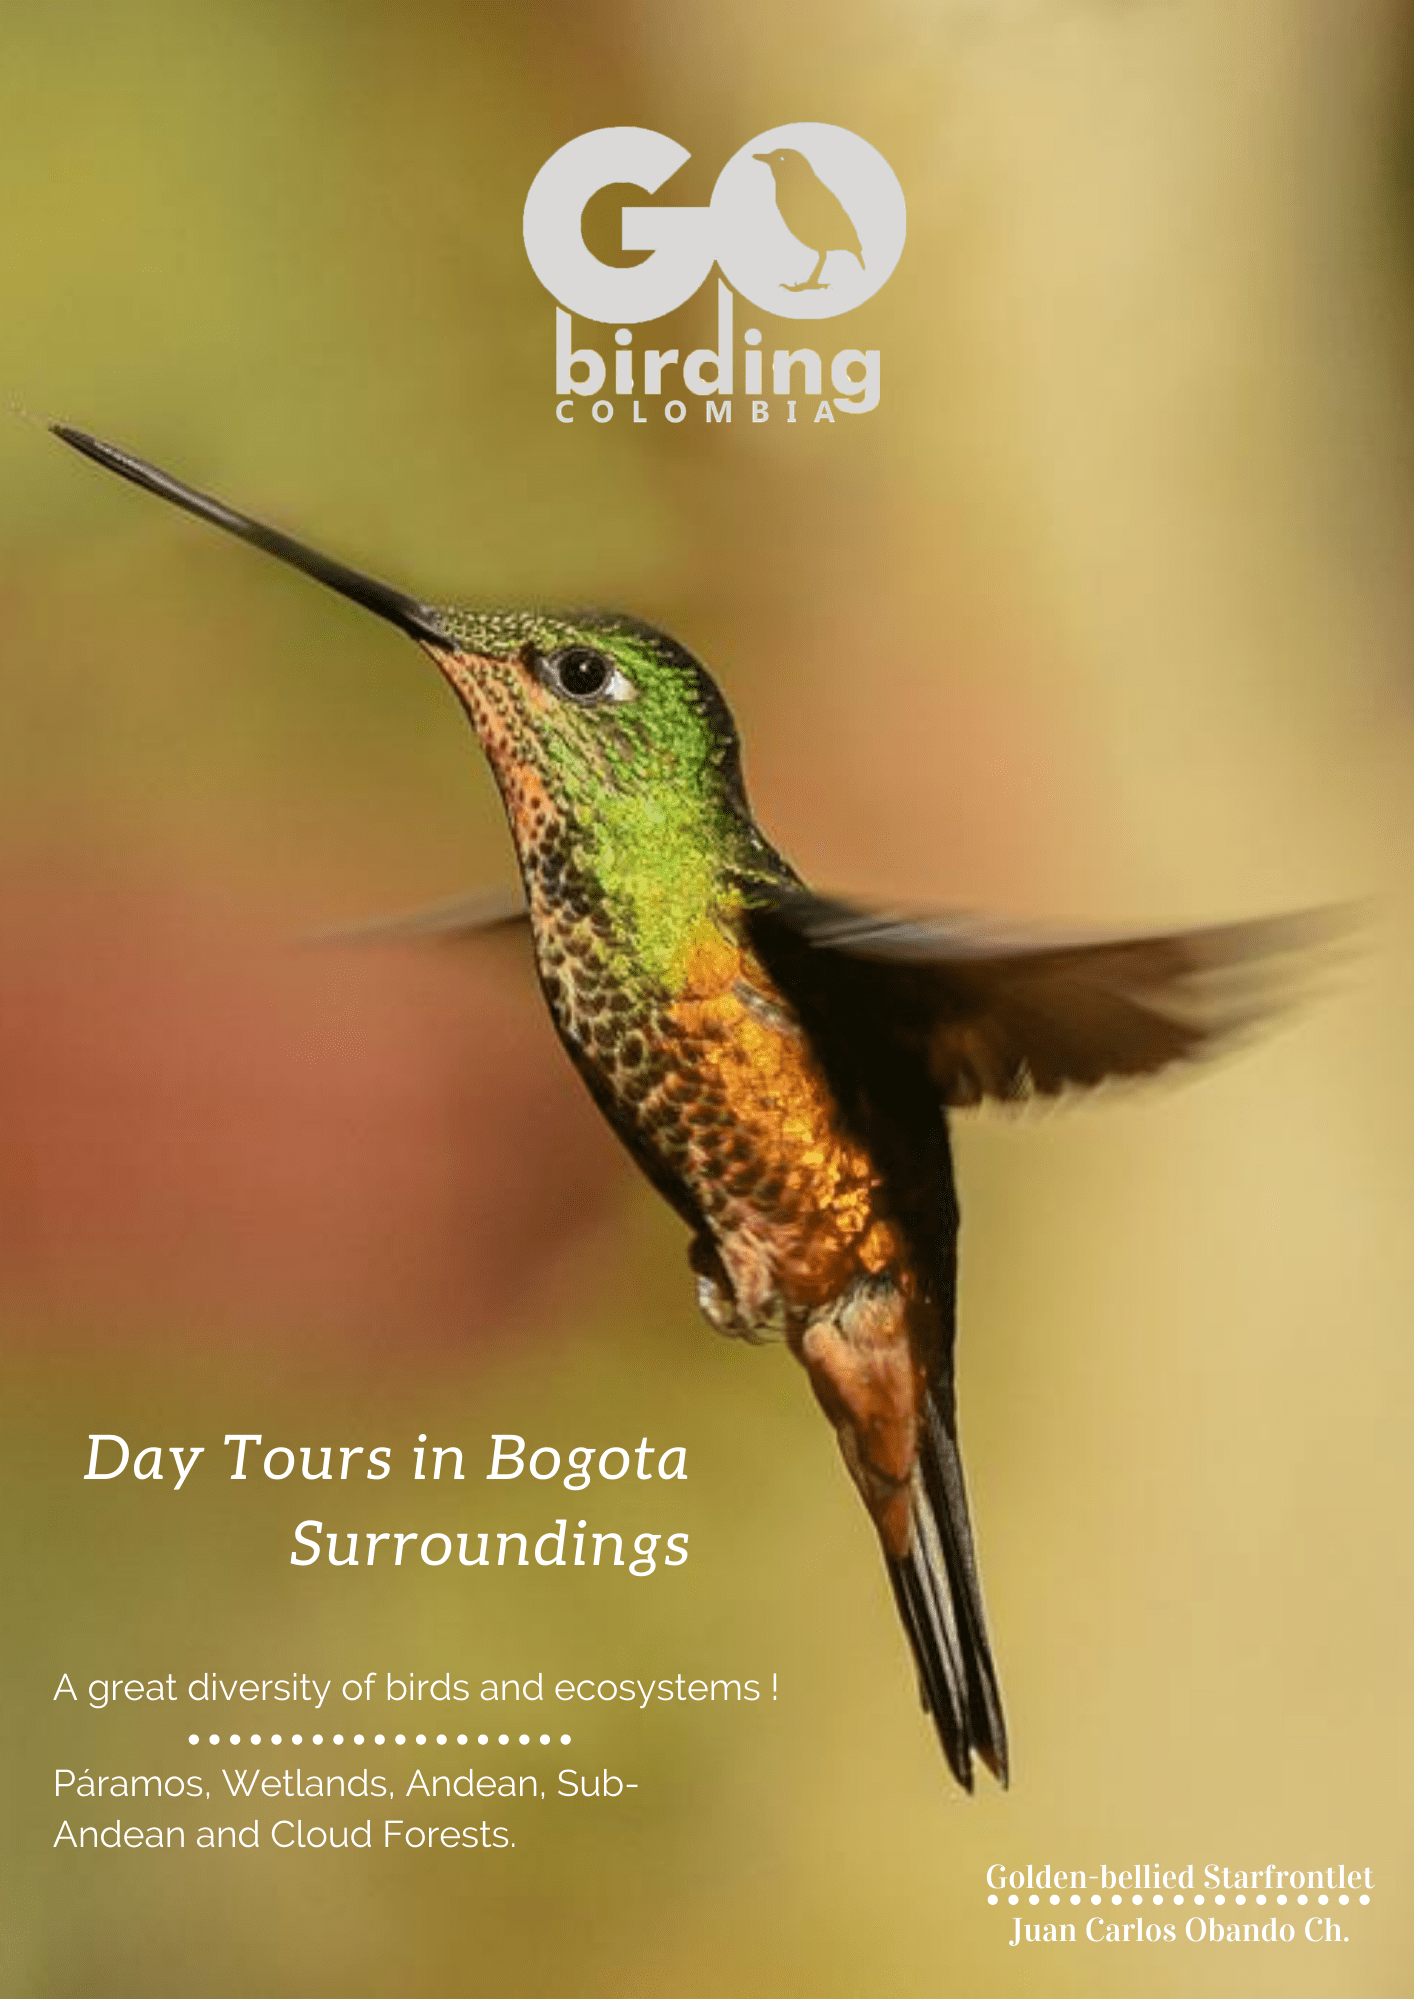 Go Birding Colombia, Day Tours Bogota.